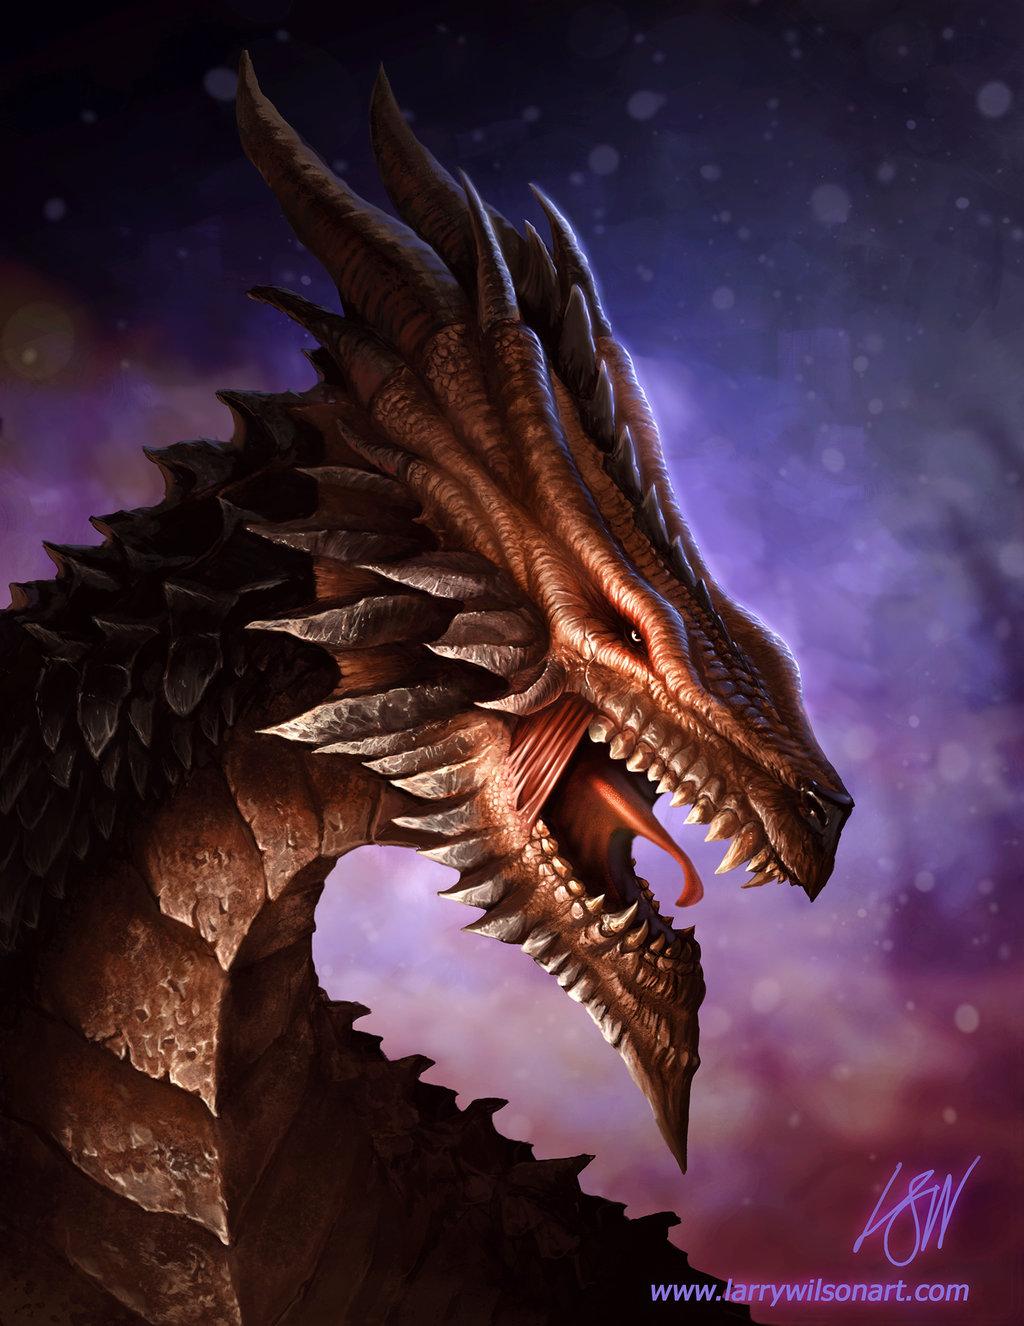 Dragon Lord - The Twilight Sentinel